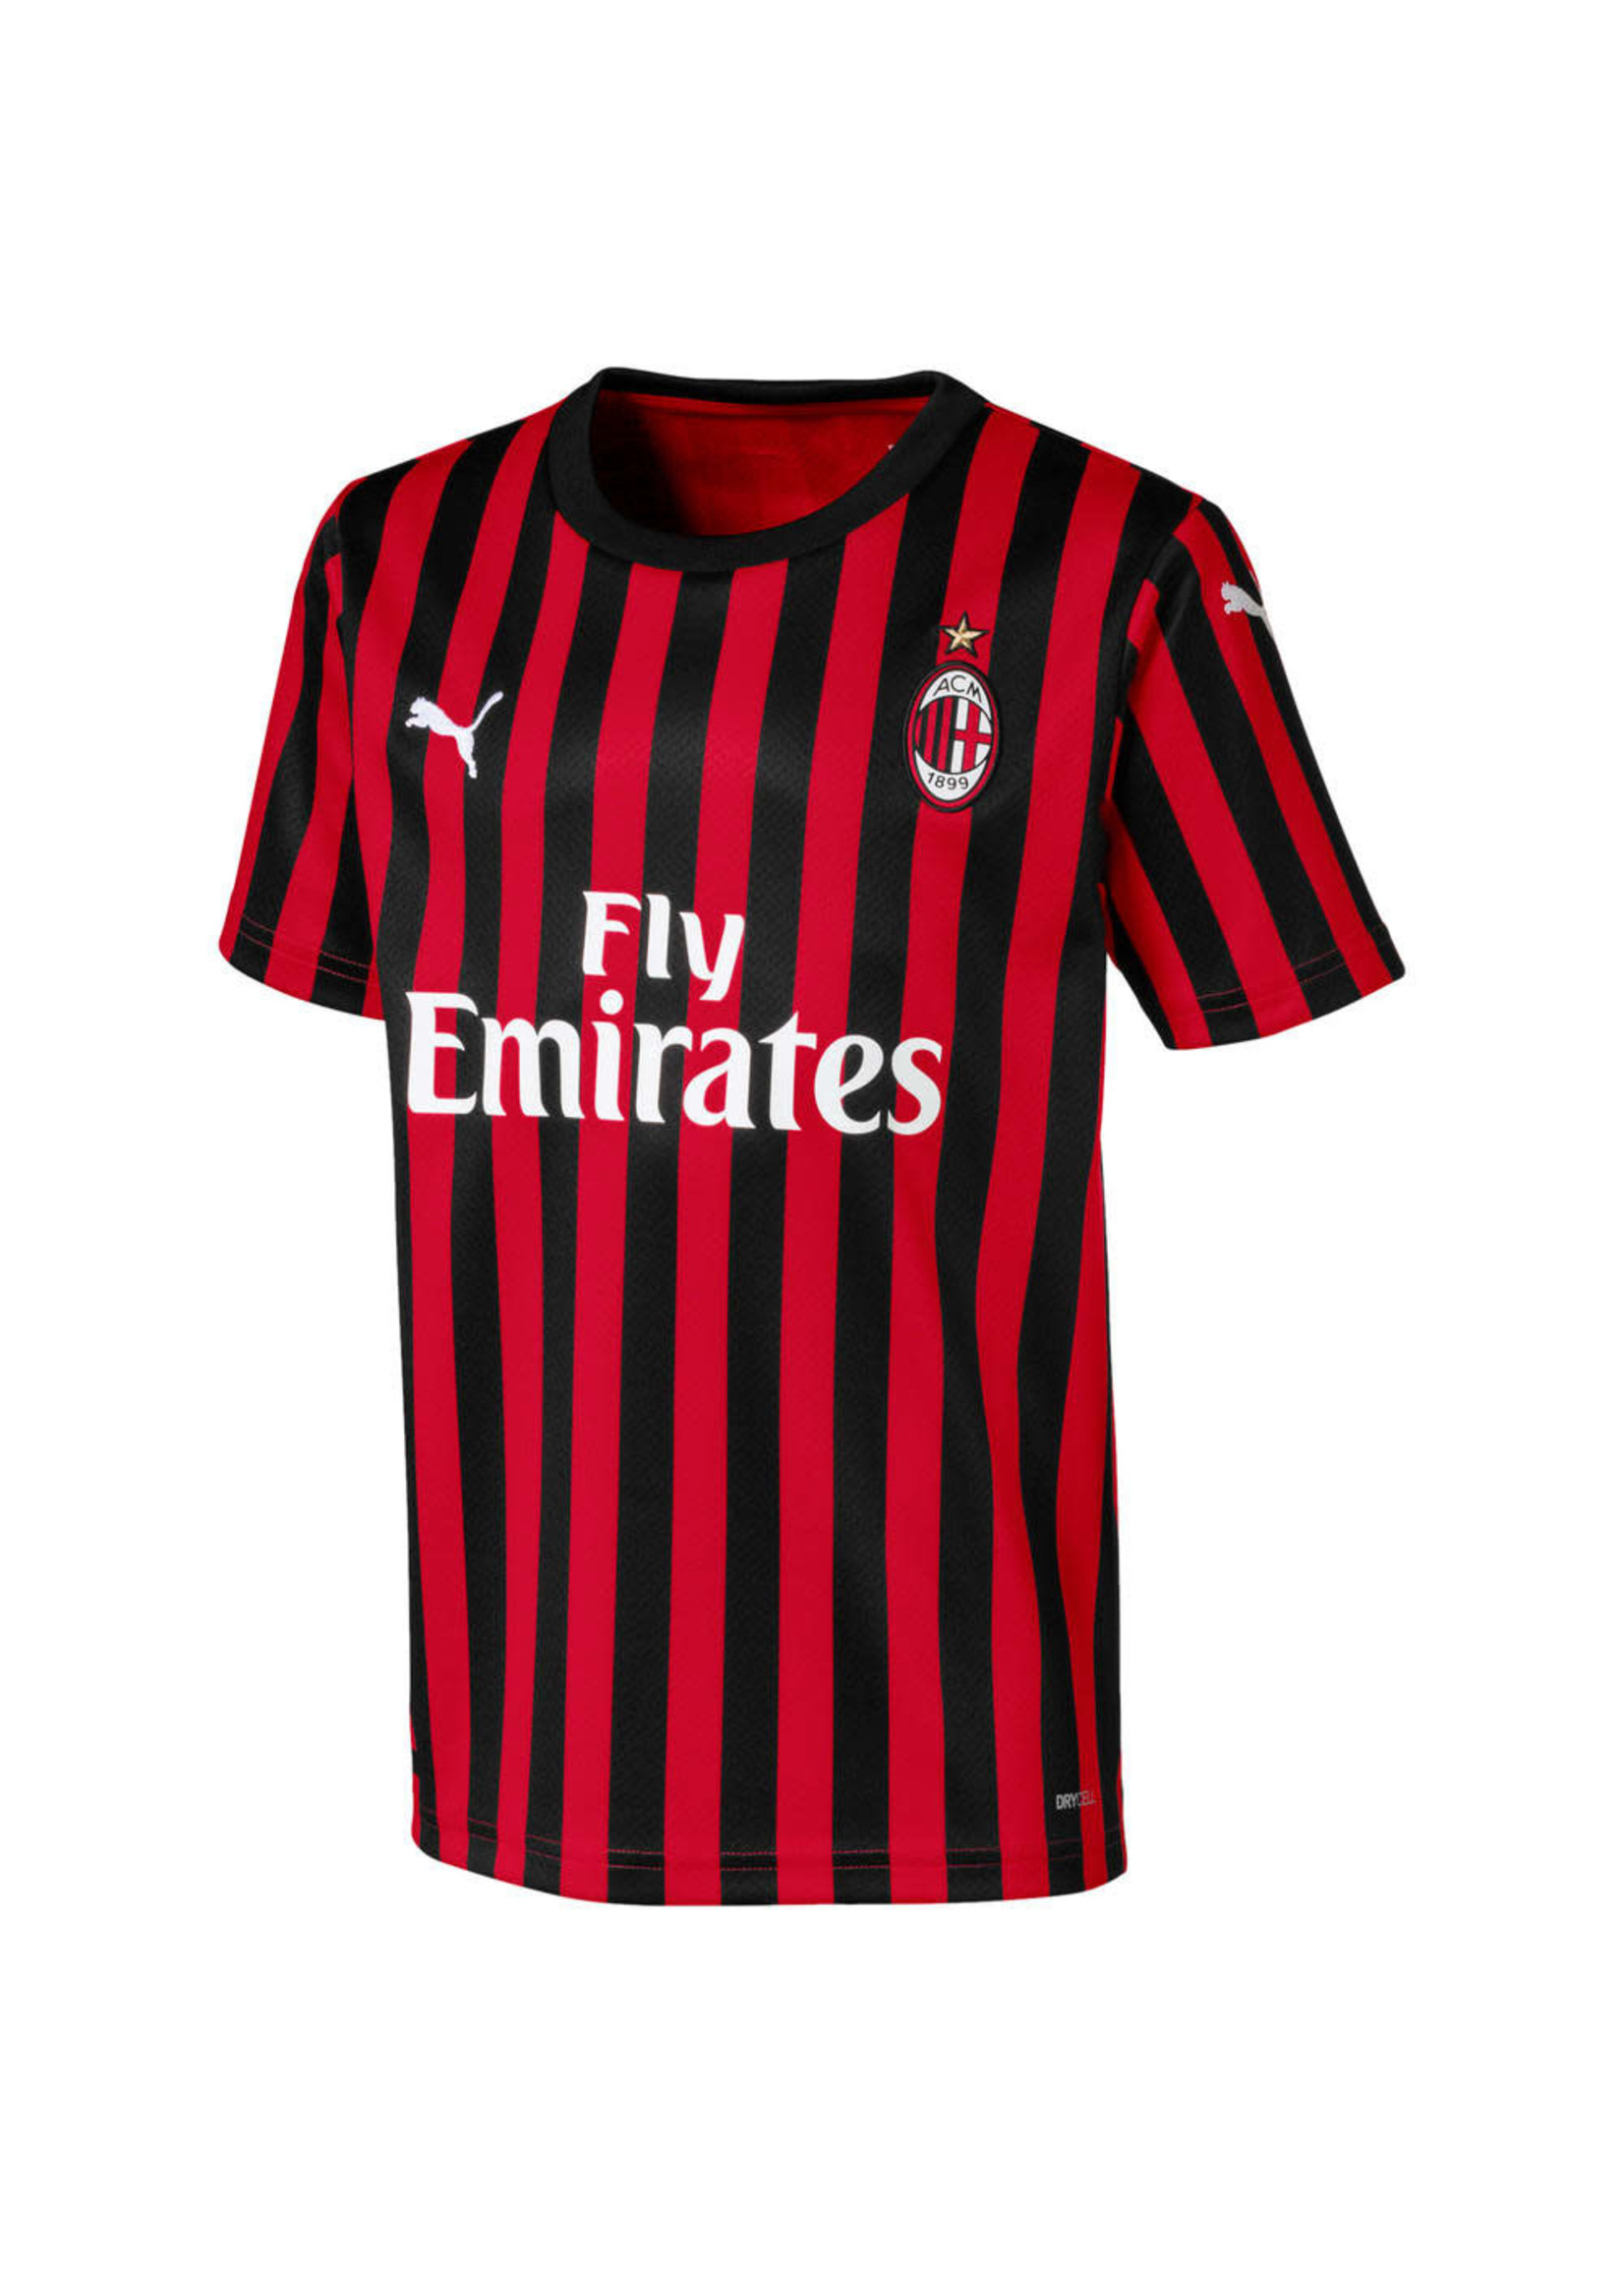 Puma AC Milan 19/20 Home Jersey Youth